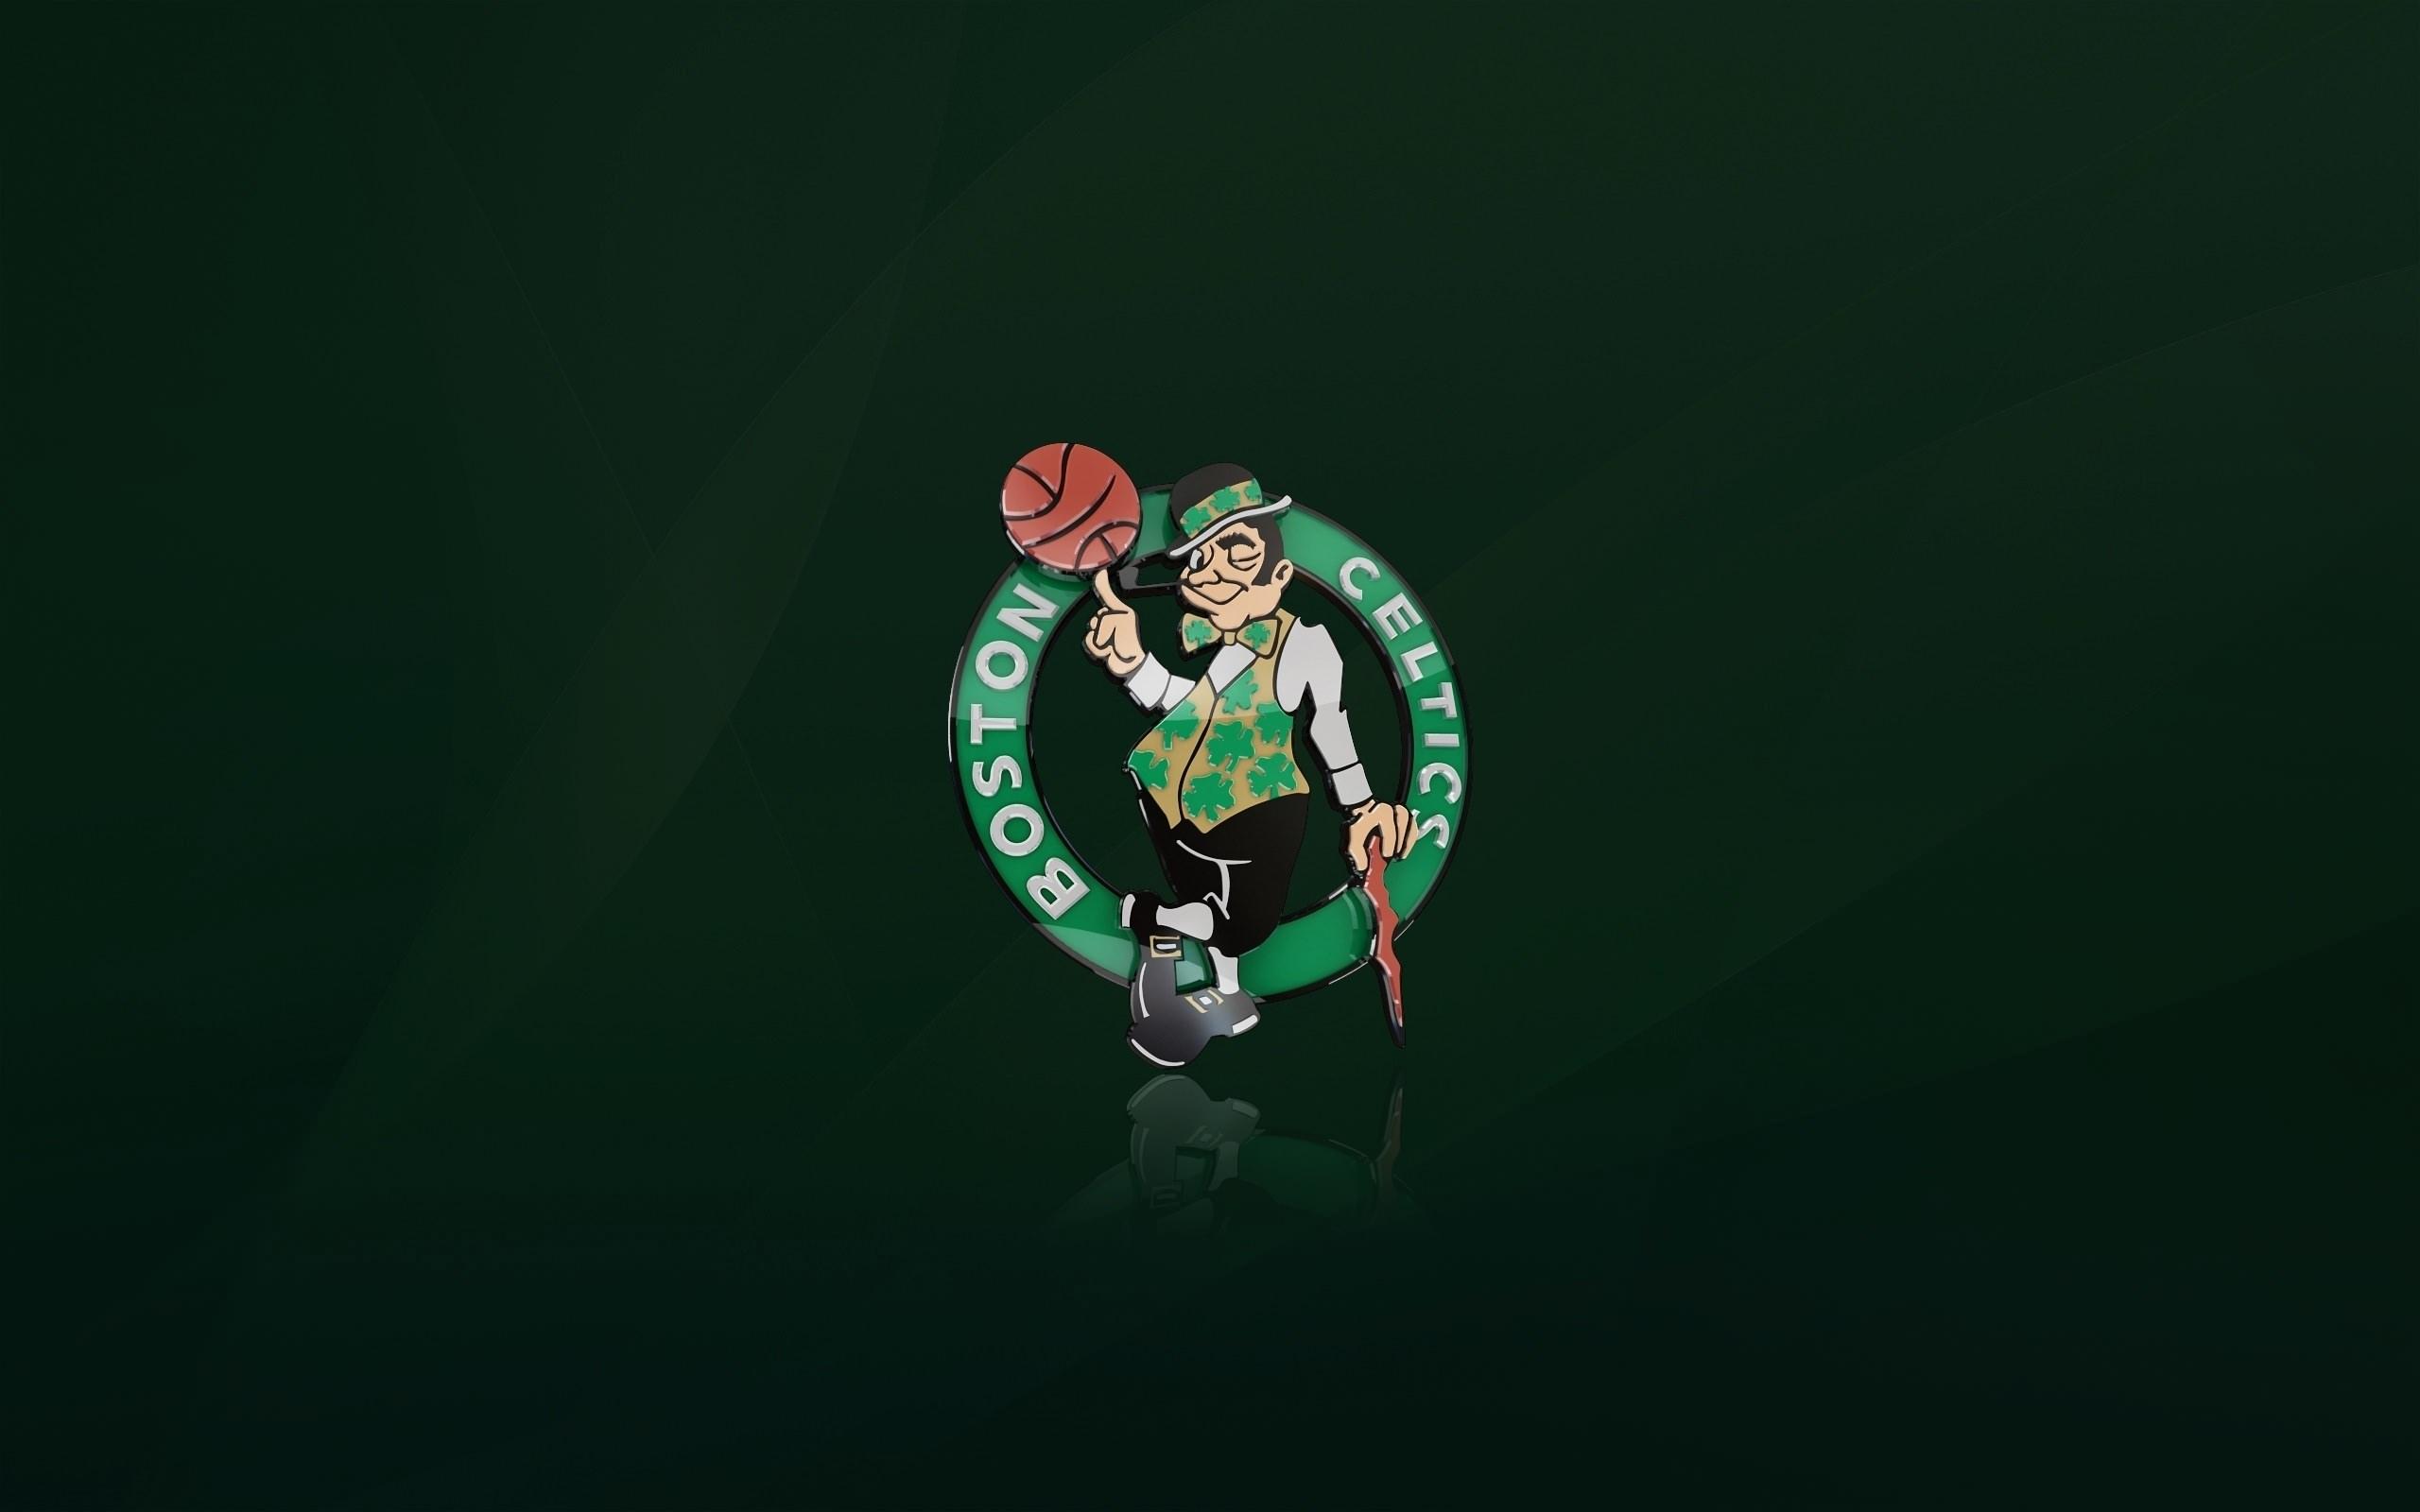 Boston Celtics Logo Hd 2560x1600 Download Hd Wallpaper Wallpapertip